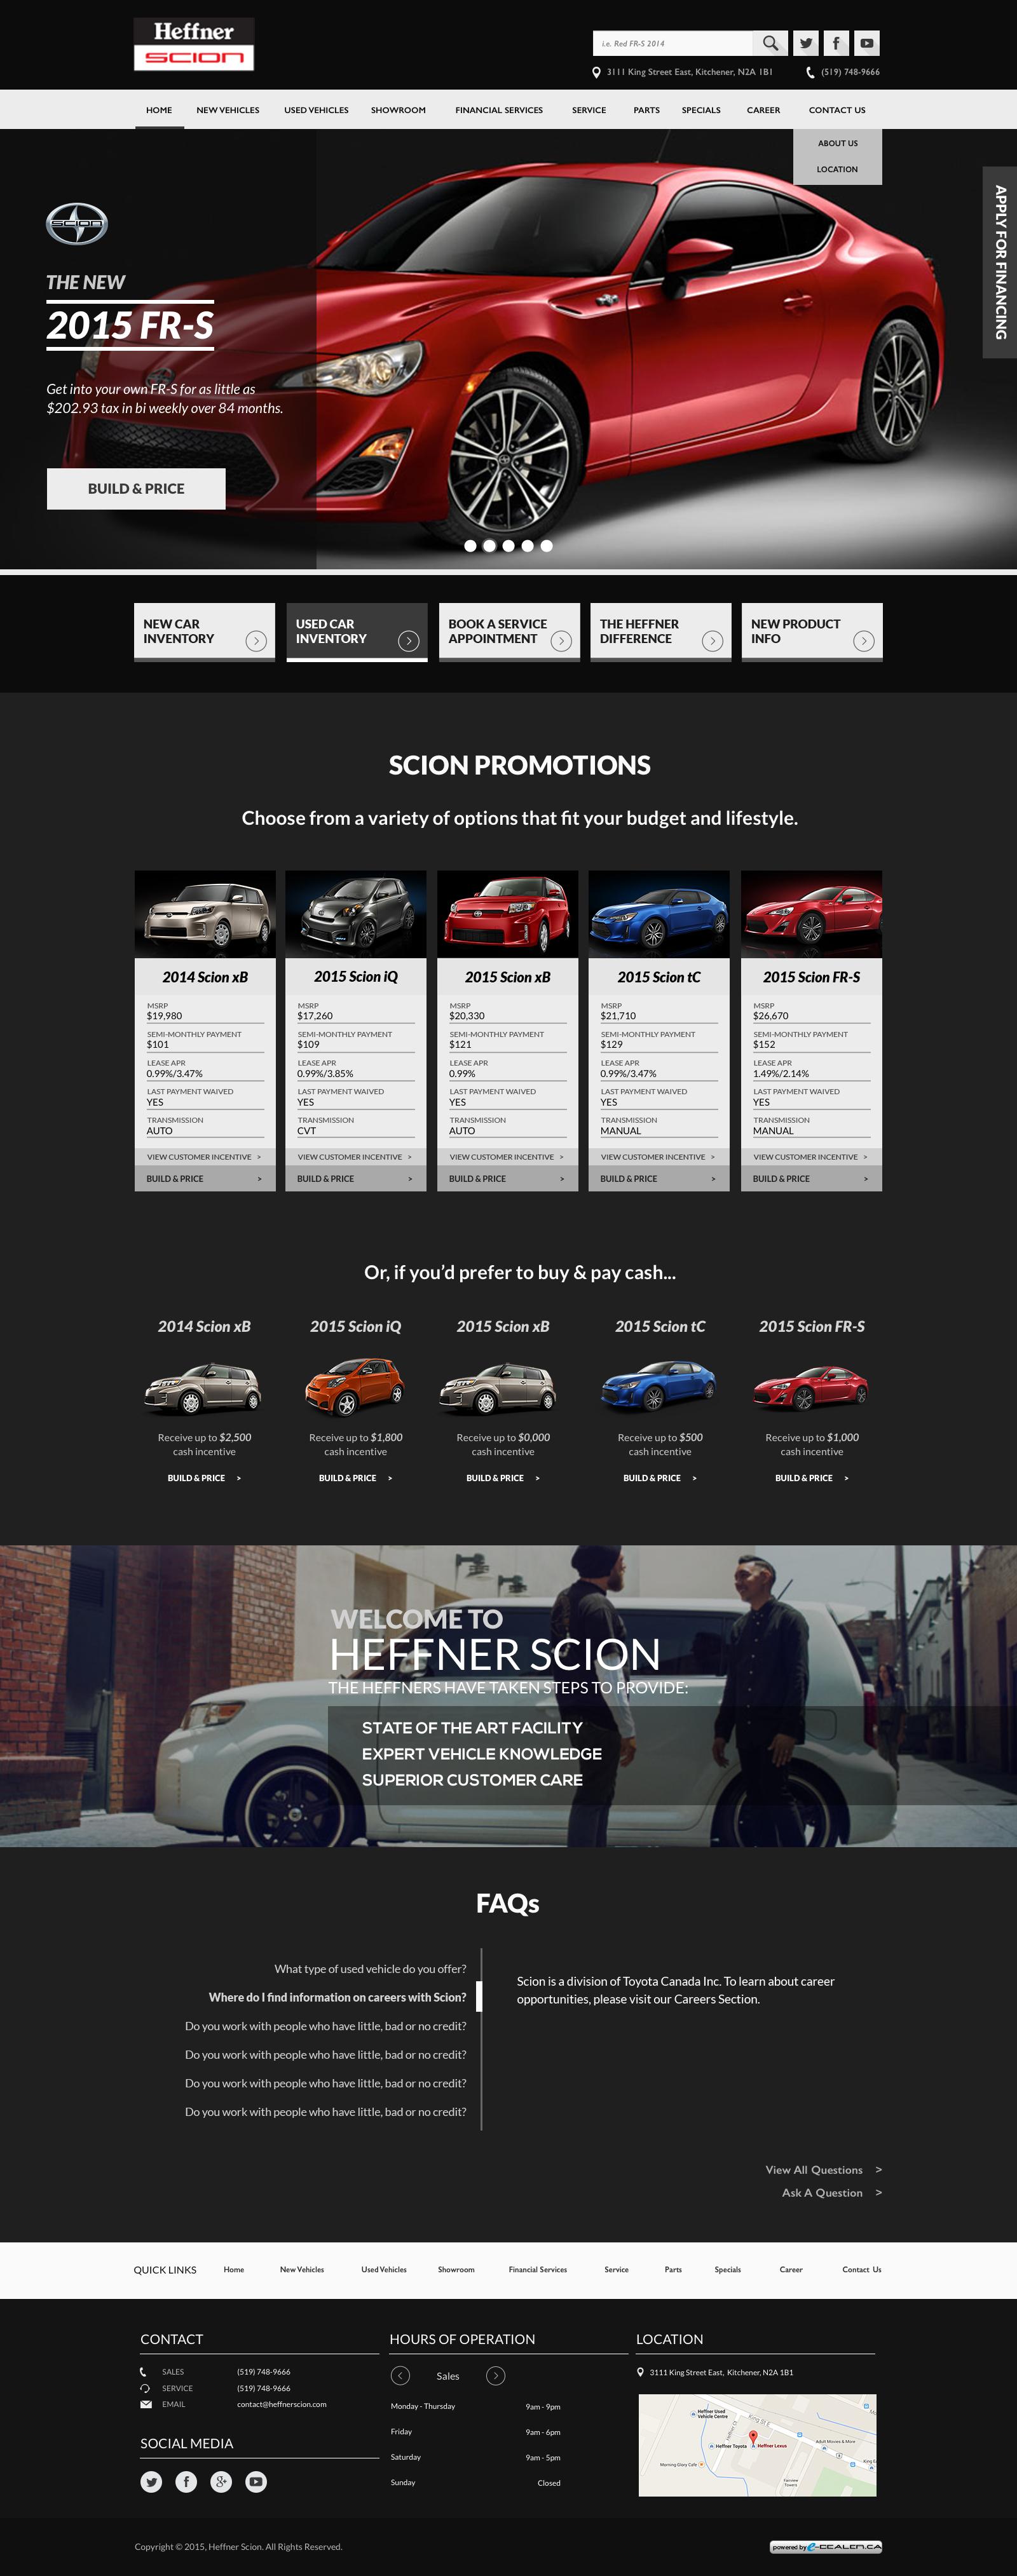 Heffner-Scion-Desktop-HomePage